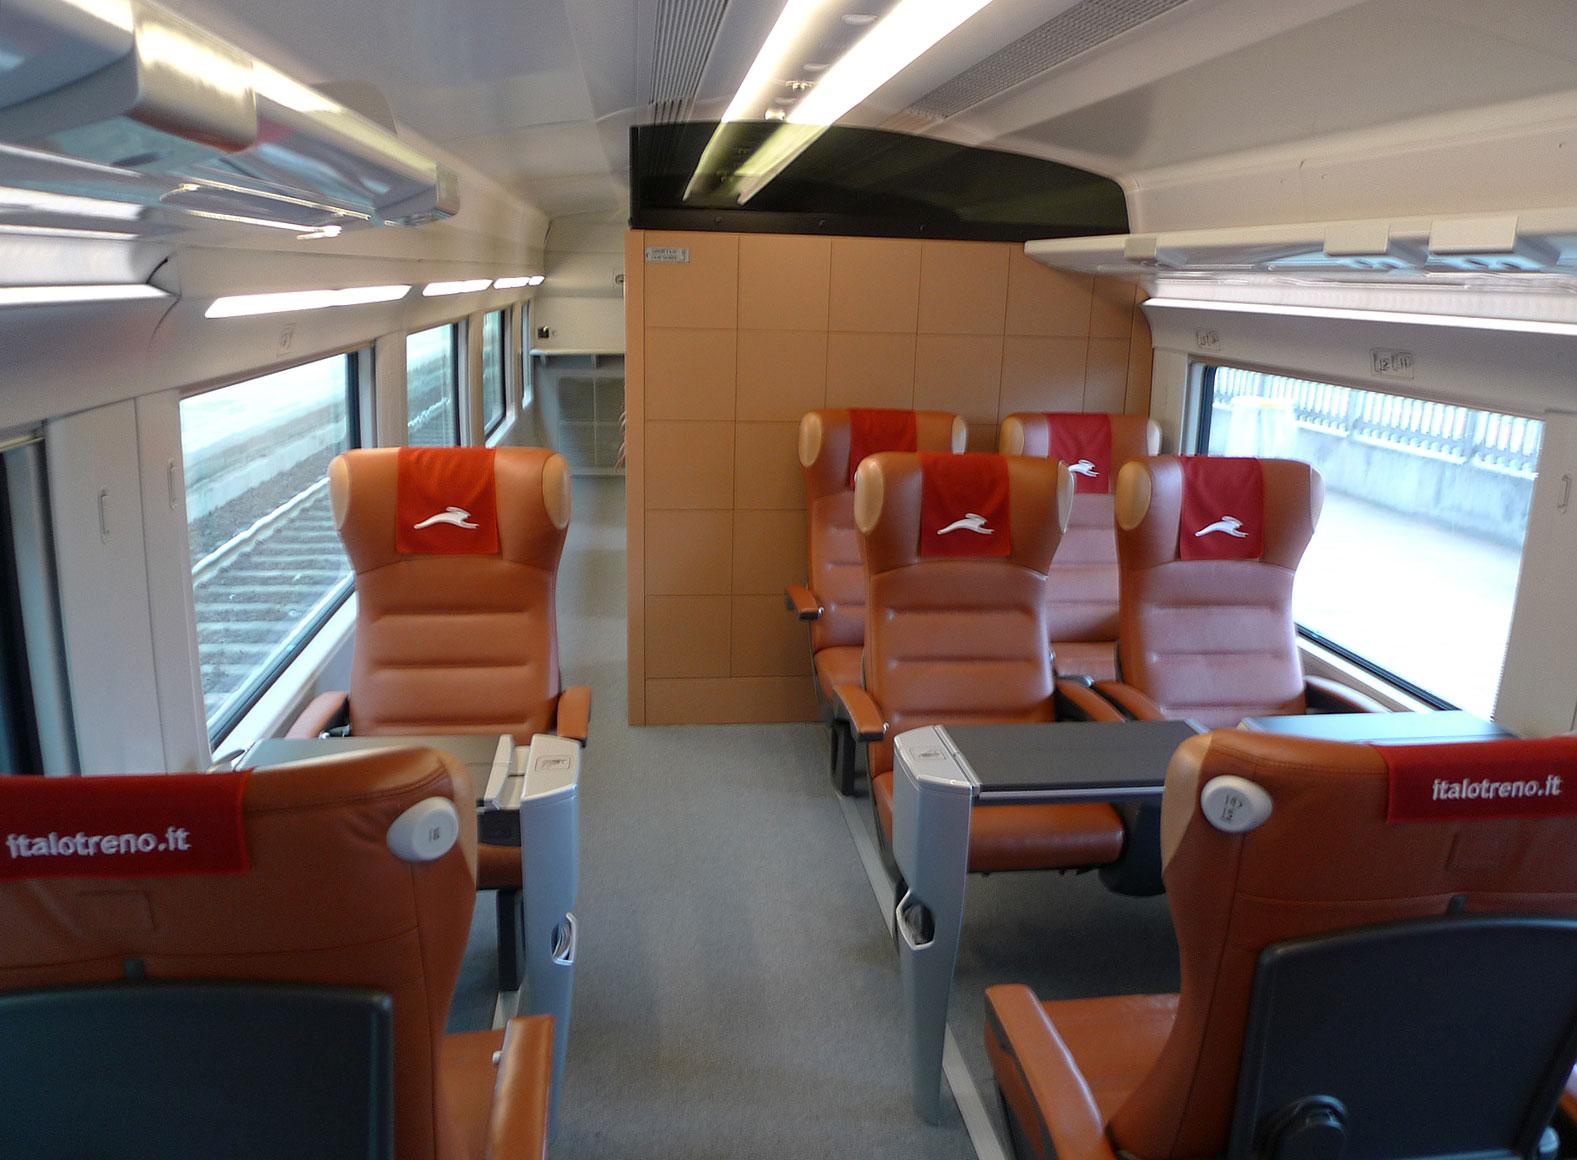 Stupendous Italo Trains Italo Tickets From 15 Beatyapartments Chair Design Images Beatyapartmentscom